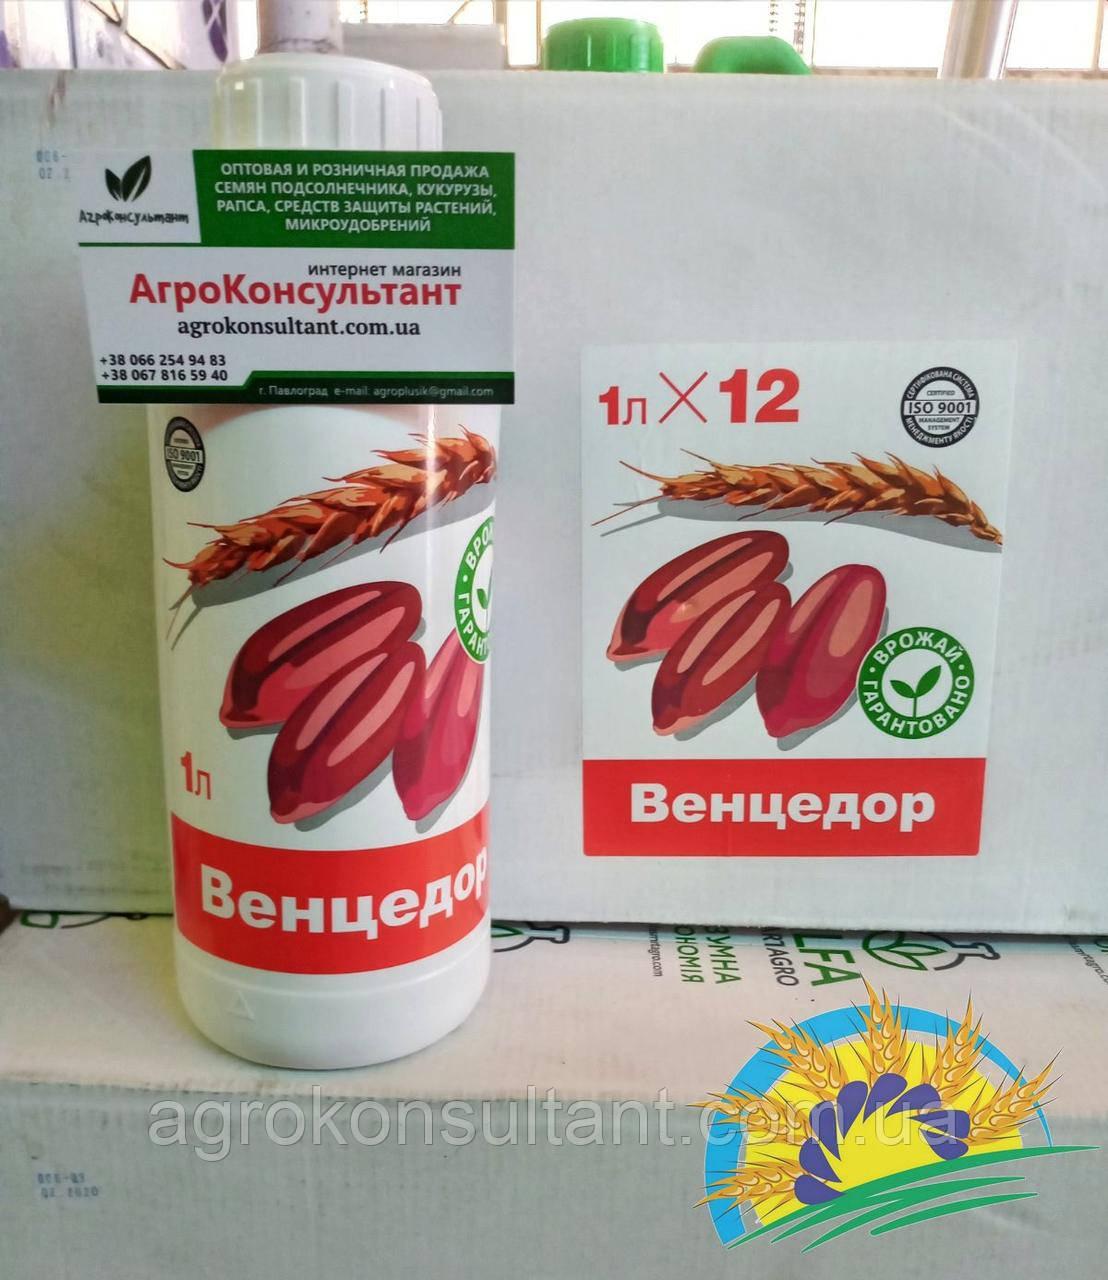 Венцедор, 1л — ФУНГИЦИДНЫЙ протравитель (на 0,8-1т) (тирам 400 г/л + тебуконазол 25 г/л). ALFA Smart Agro